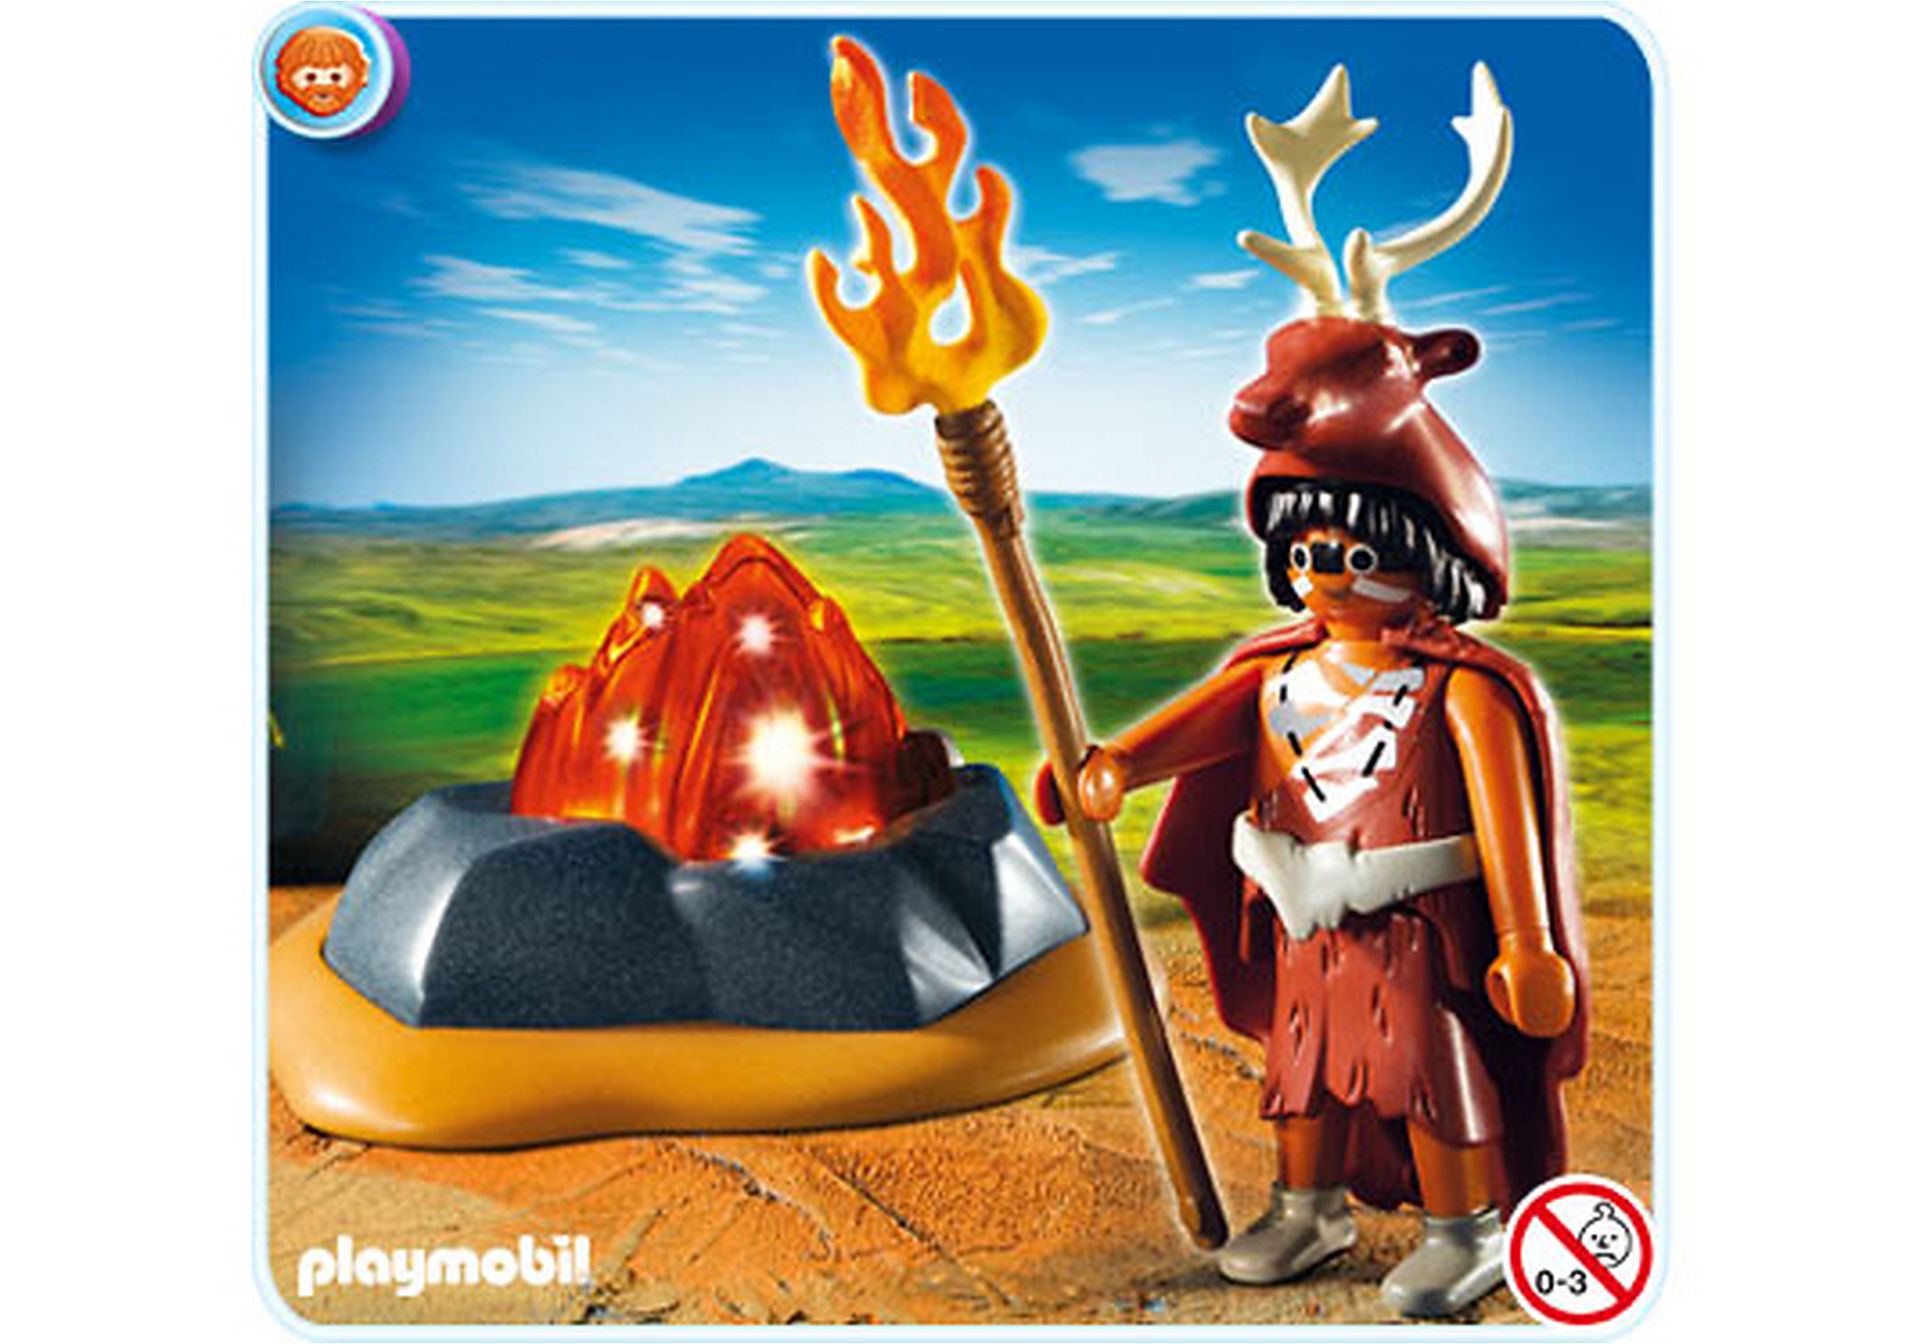 http://media.playmobil.com/i/playmobil/5104-A_product_detail/Feuerhüter mit LED-Feuerfels